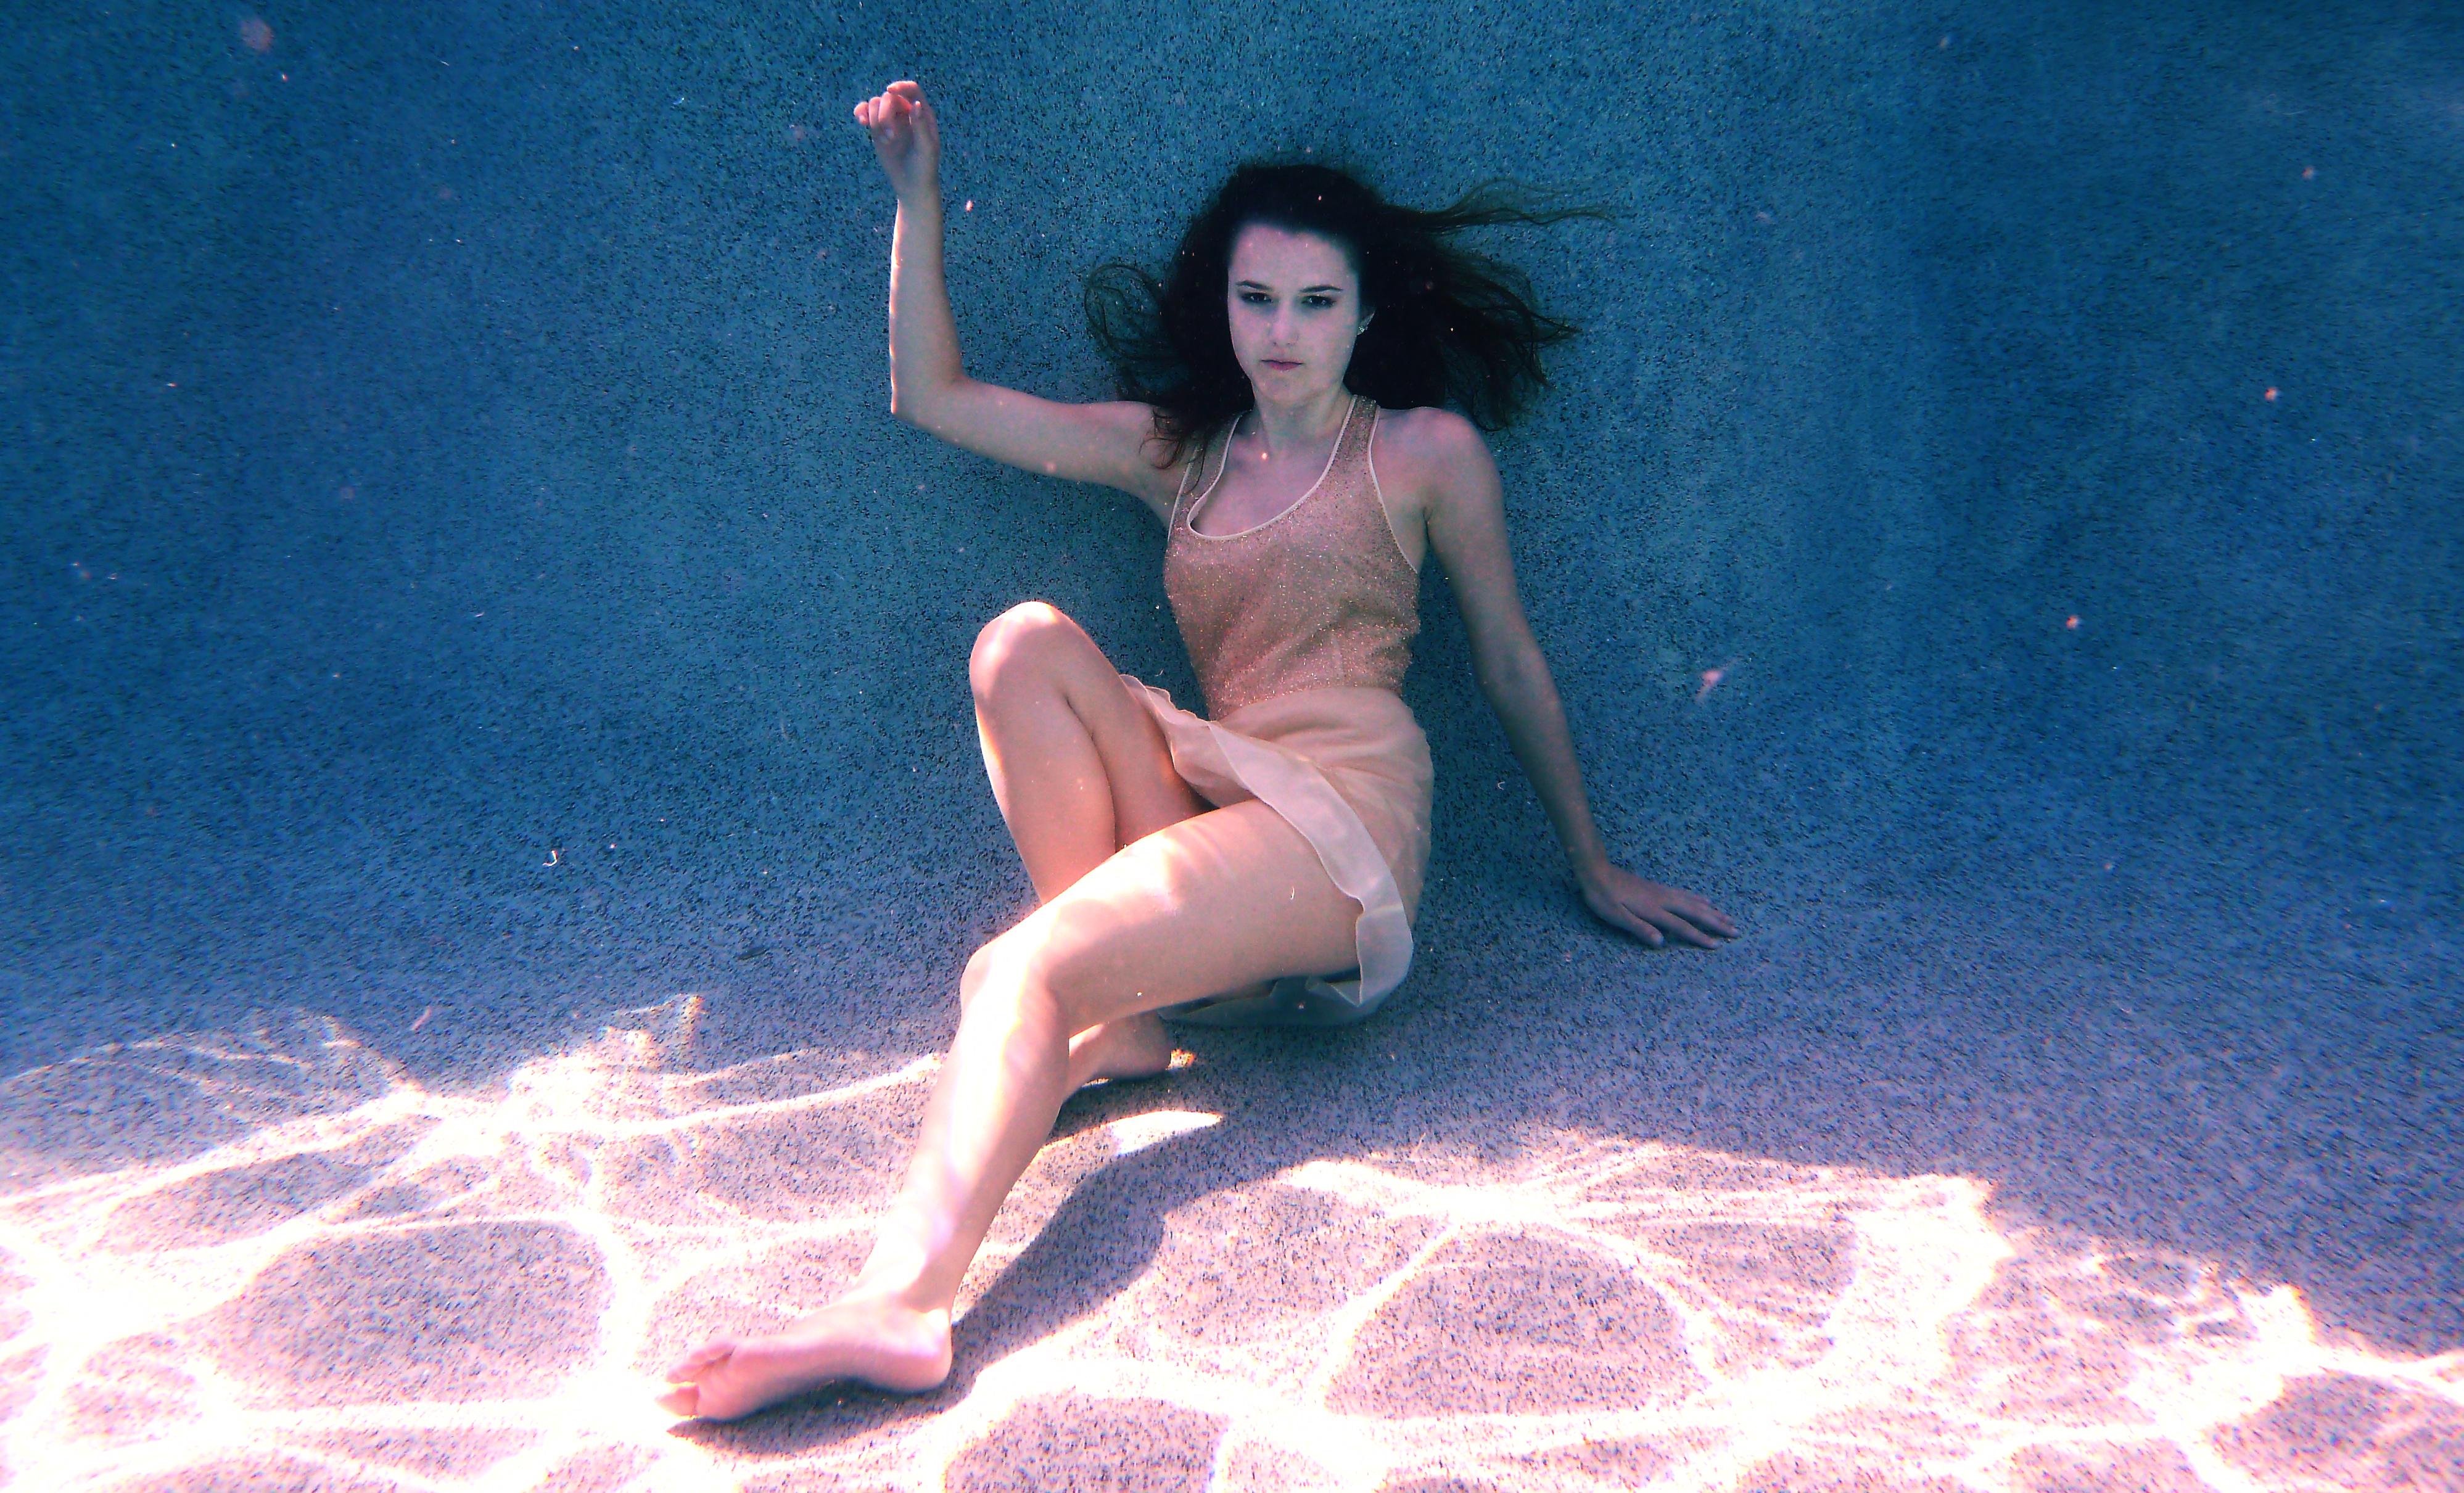 Nude swimming pool girl modelling #4